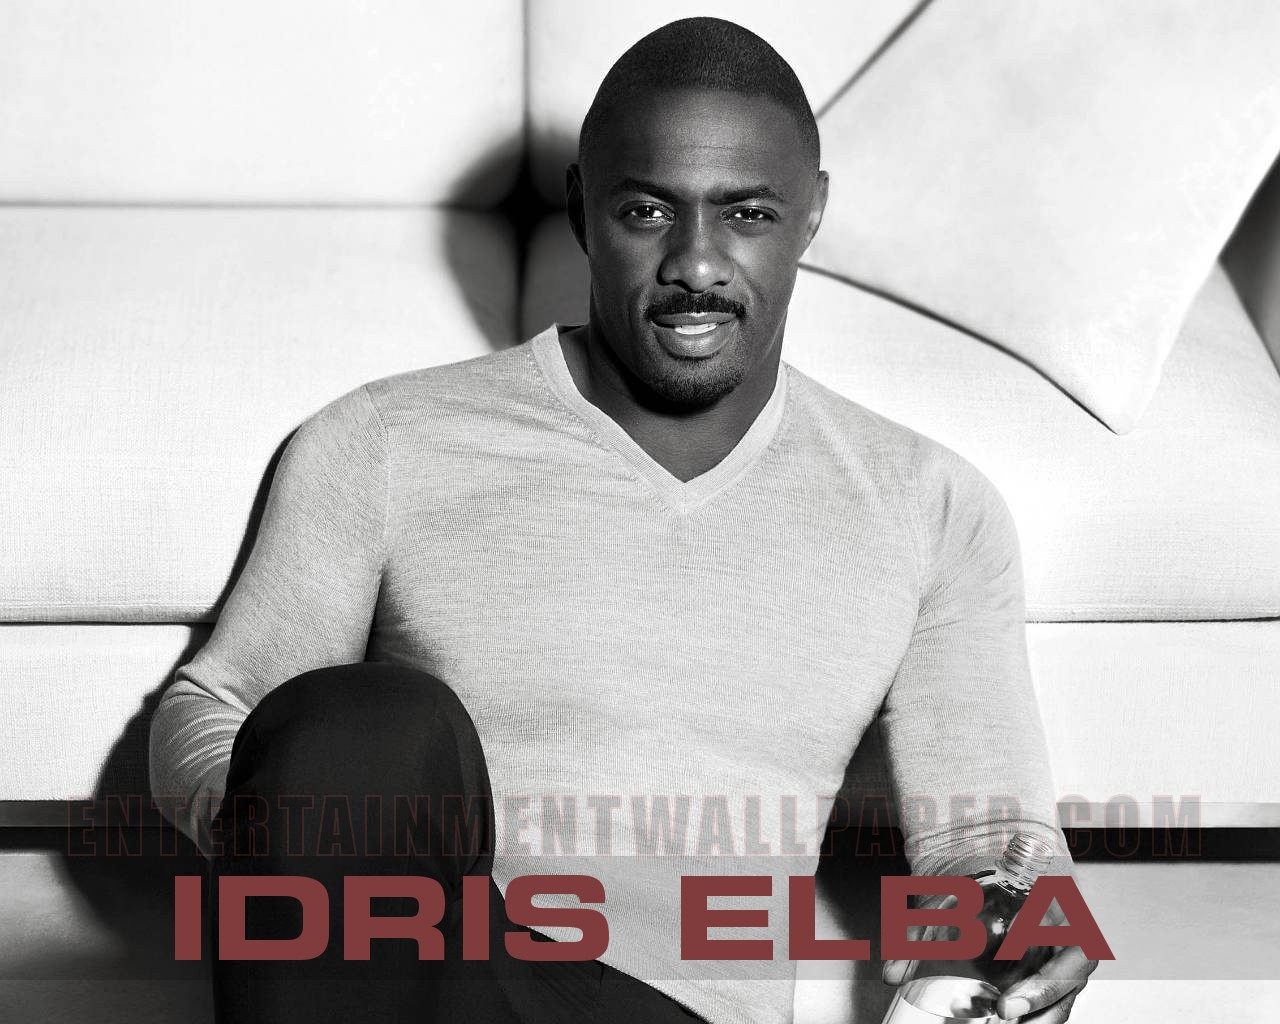 Idris Elba 39099 1920x1200 px